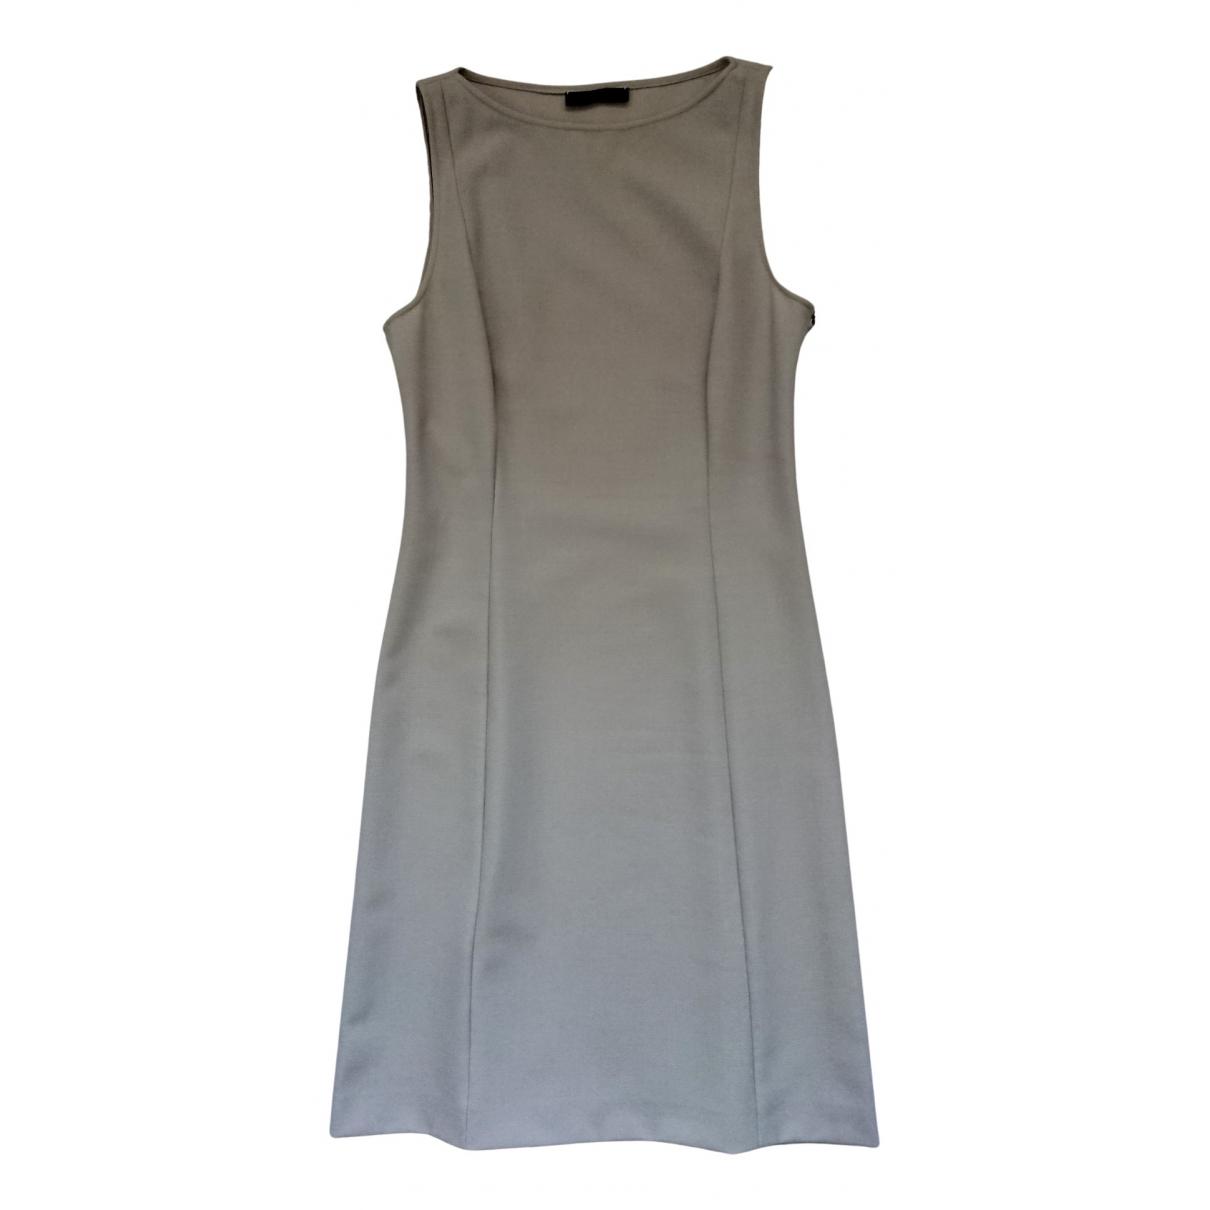 Emporio Armani \N Kleid in  Grau Polyester